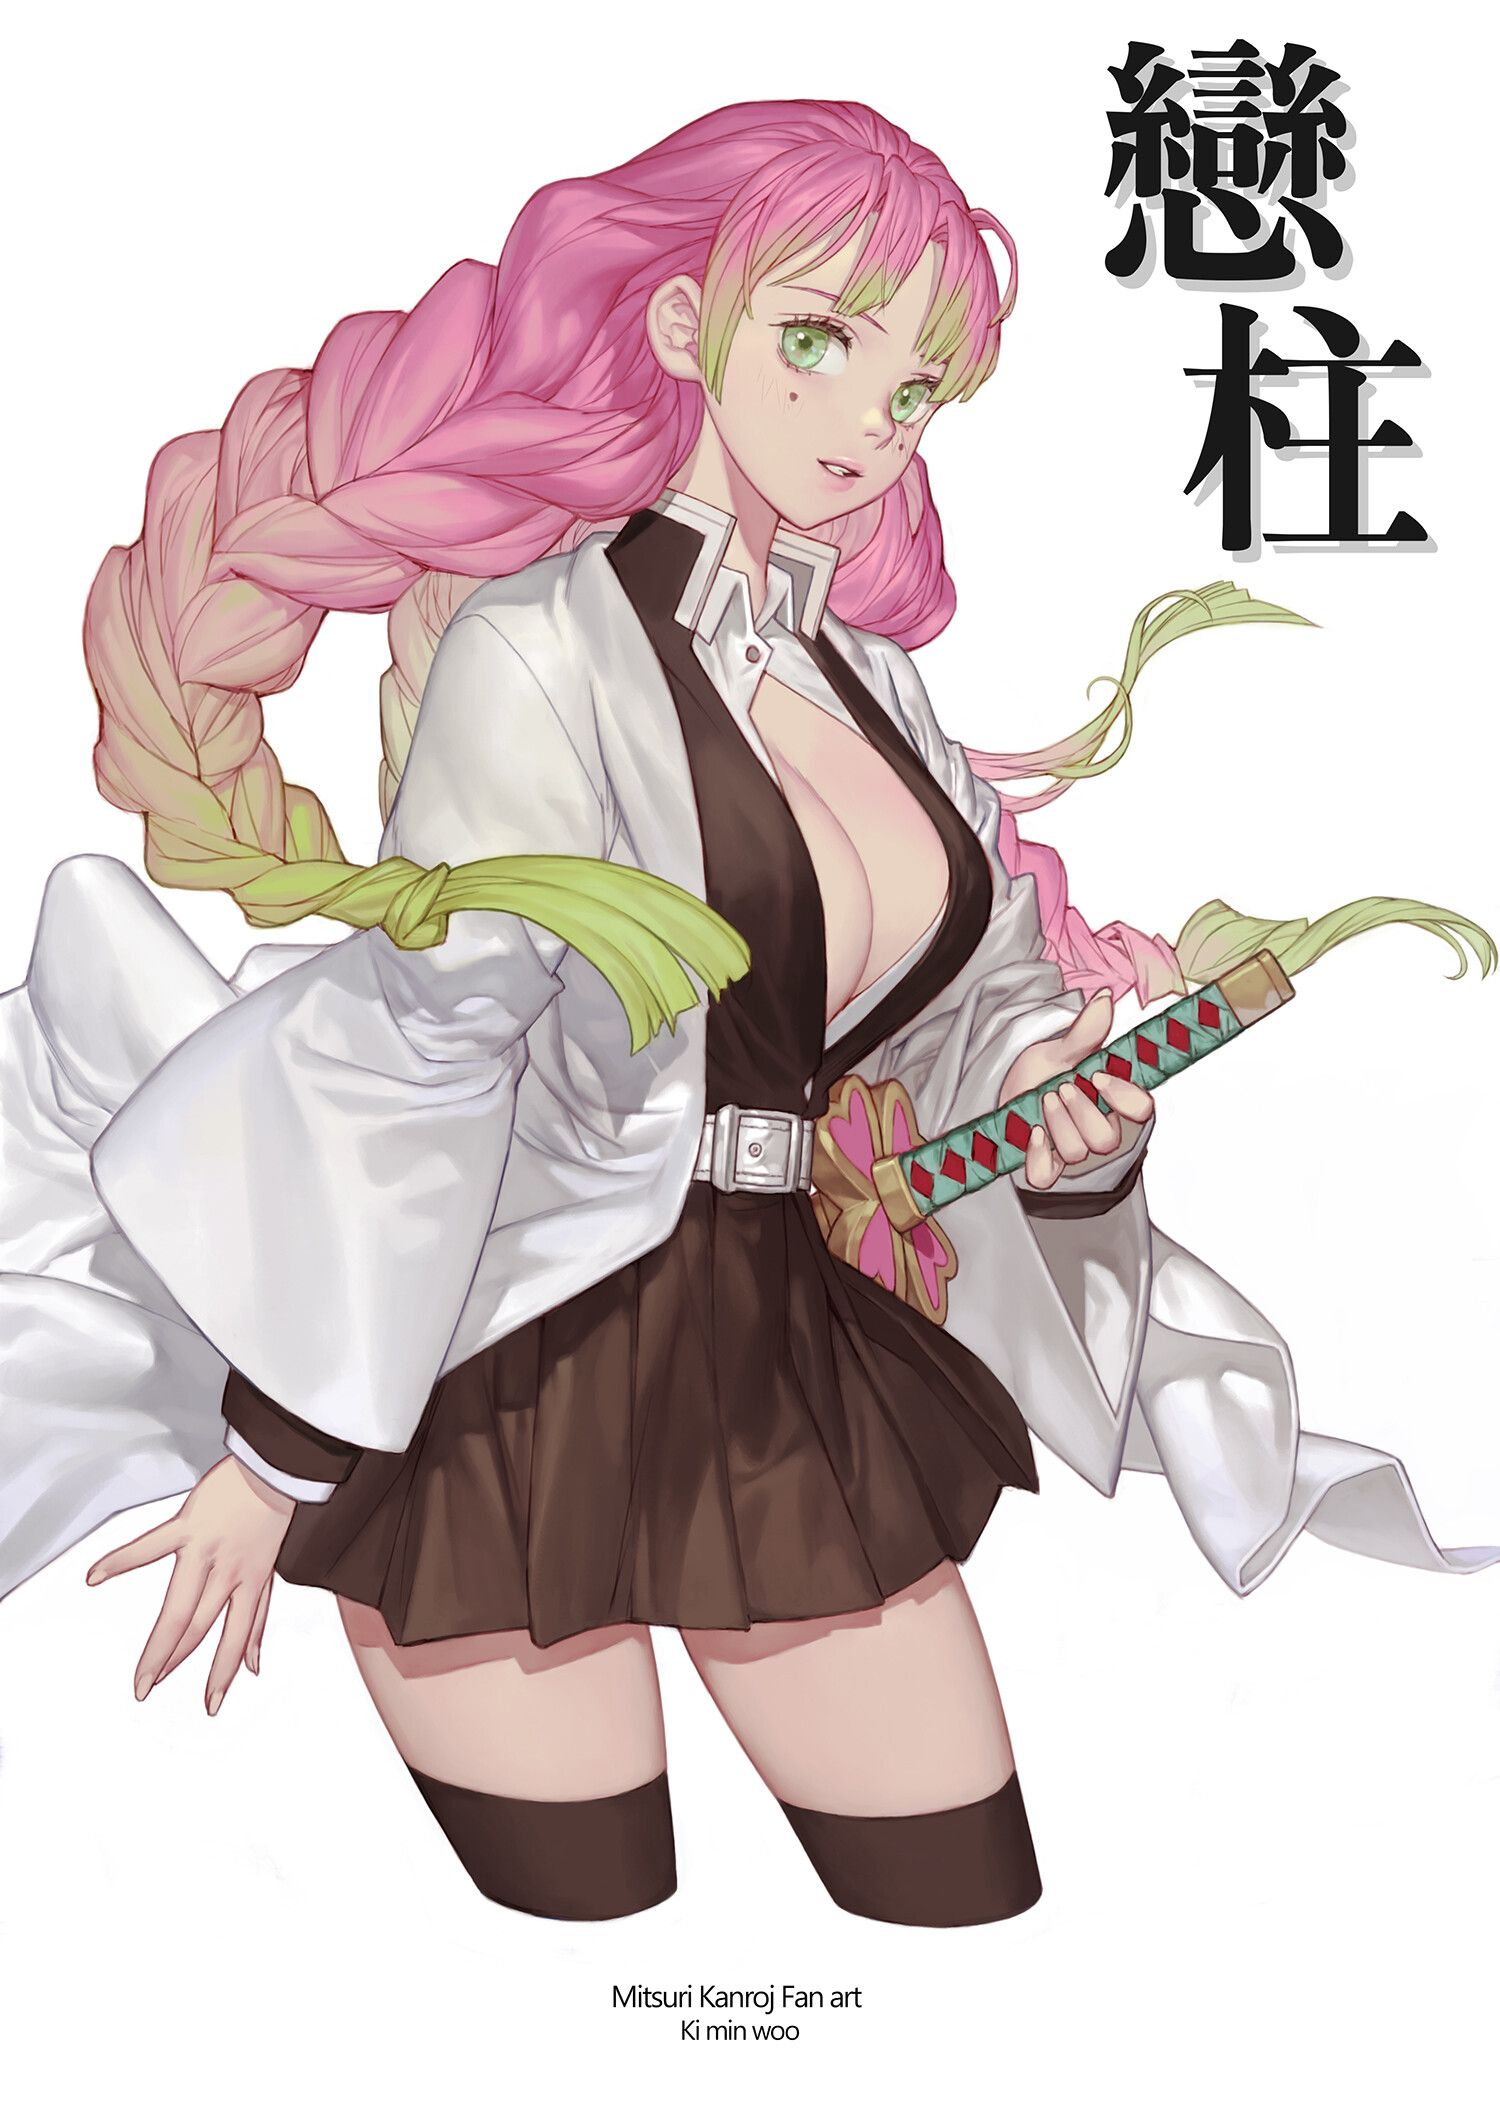 Mitsuri Kanroji Version Hombre / Mitsuri kanroji (甘 (かん) 露 (ろ) 寺 (じ) 蜜 (みつ) 璃 (り) kanroji mitsuri?) is a major supporting character of demon slayer: